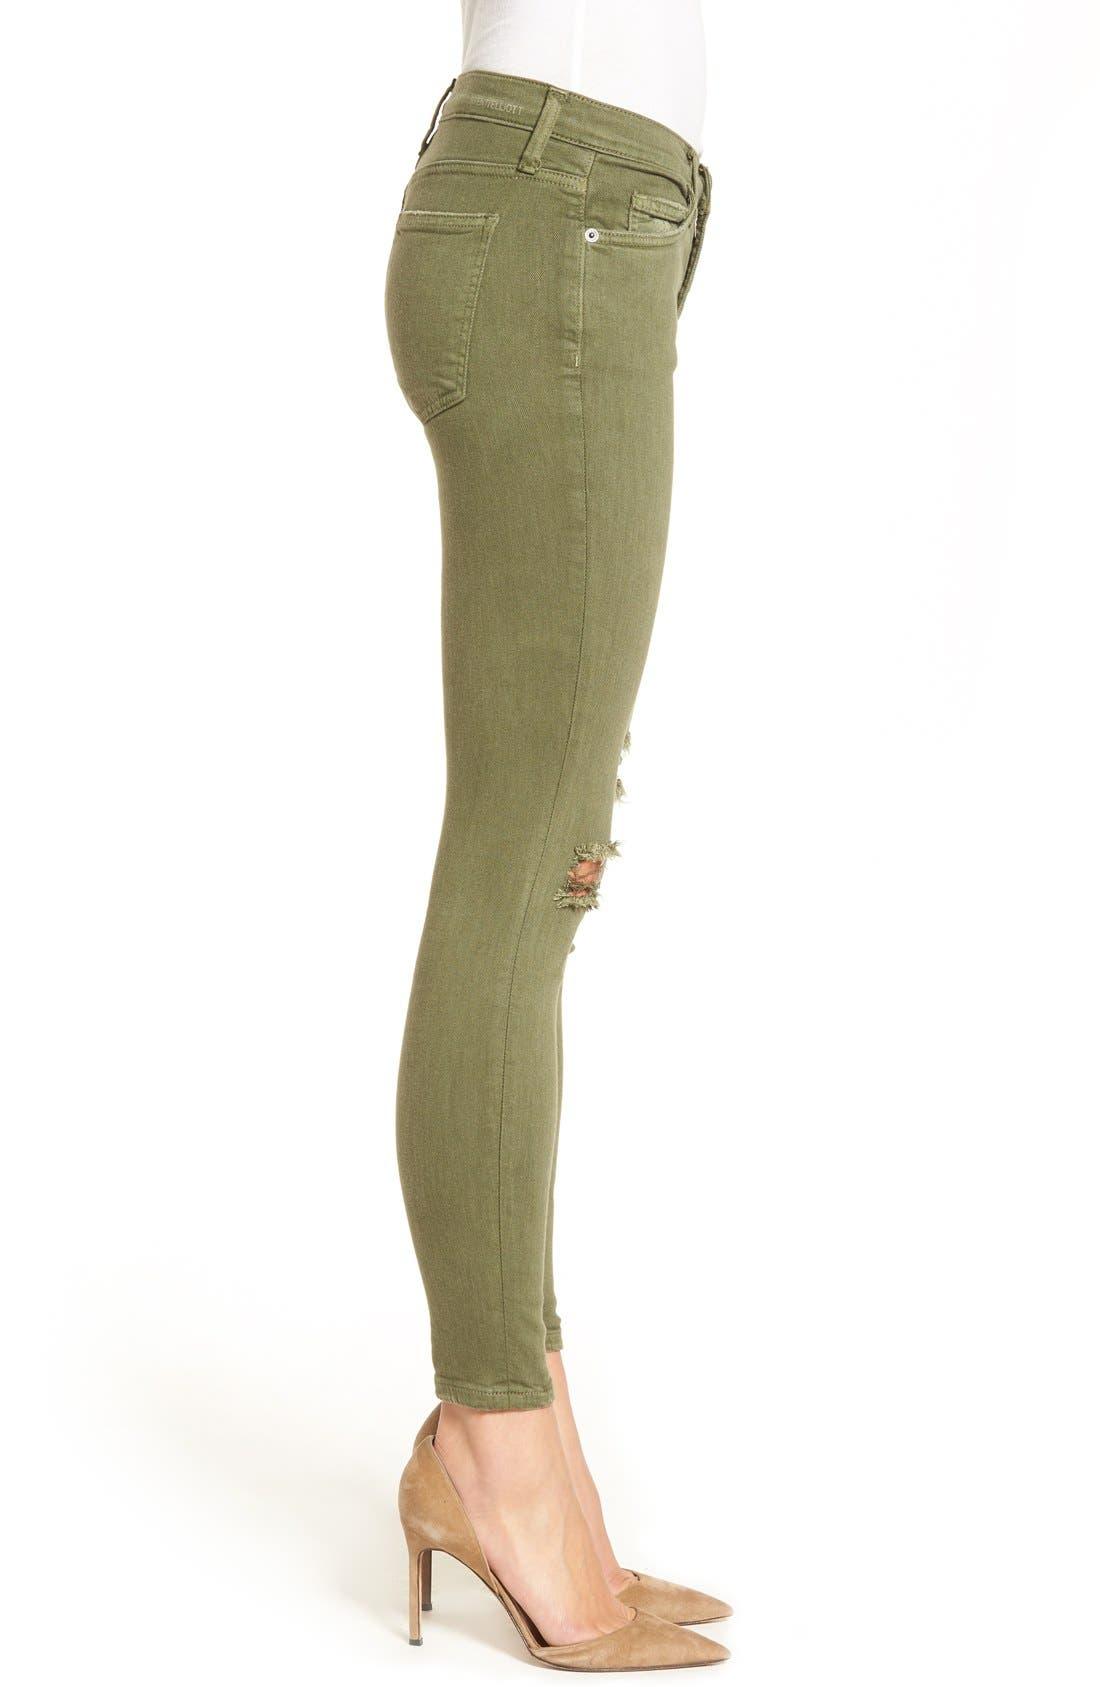 CURRENT/ELLIOTT, 'The Stiletto' Crop Skinny Jeans, Alternate thumbnail 2, color, 309